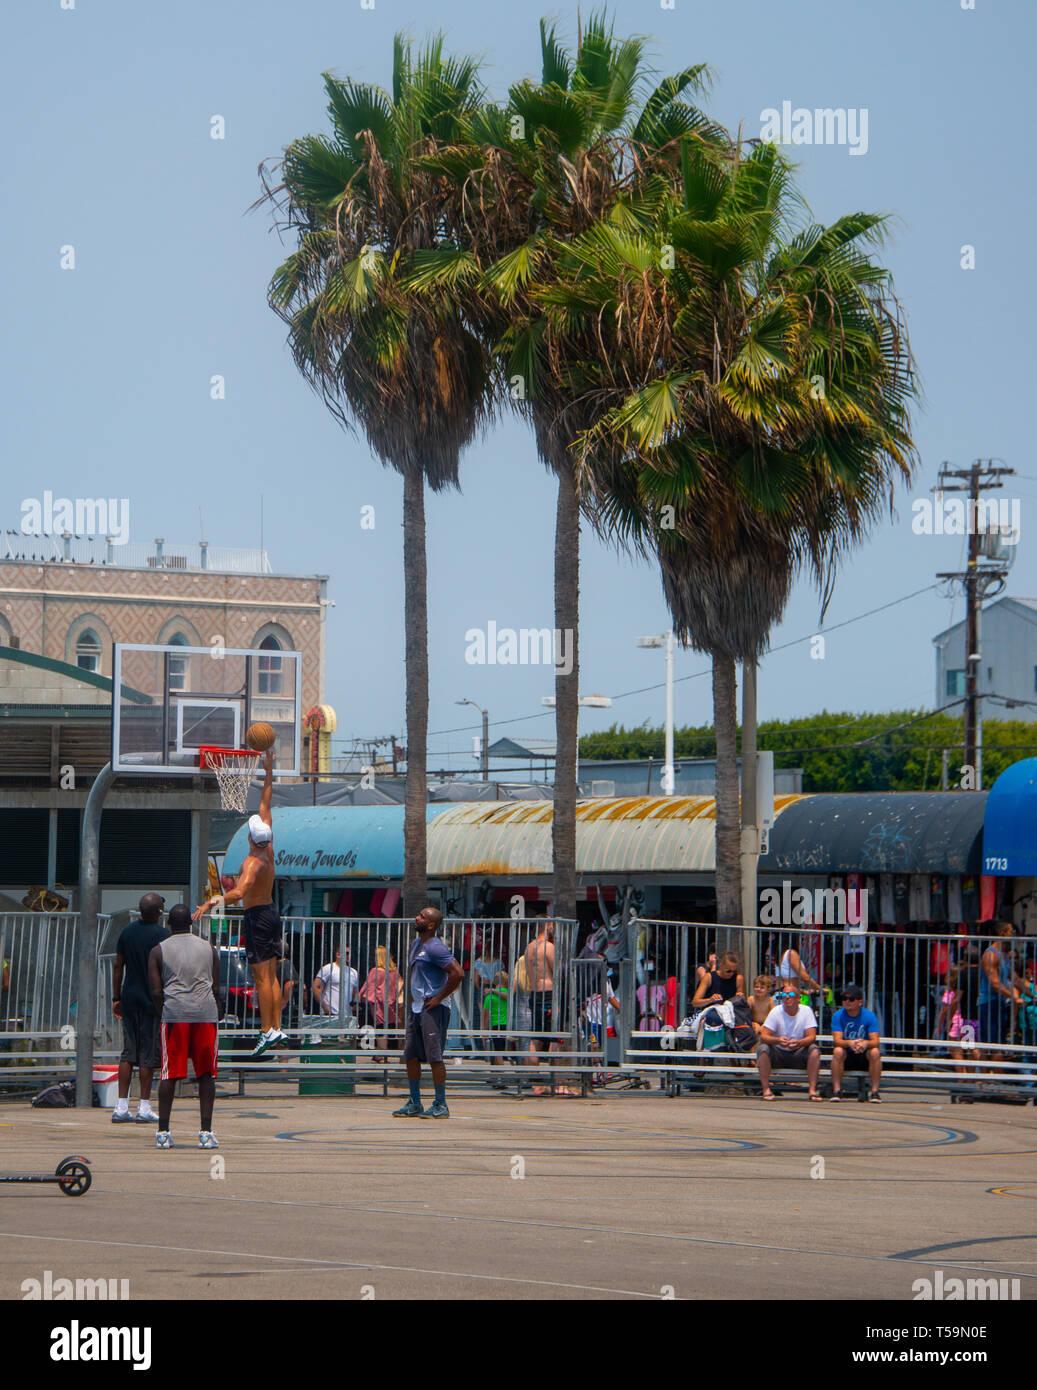 Basketball at Venice Beach - Stock Image